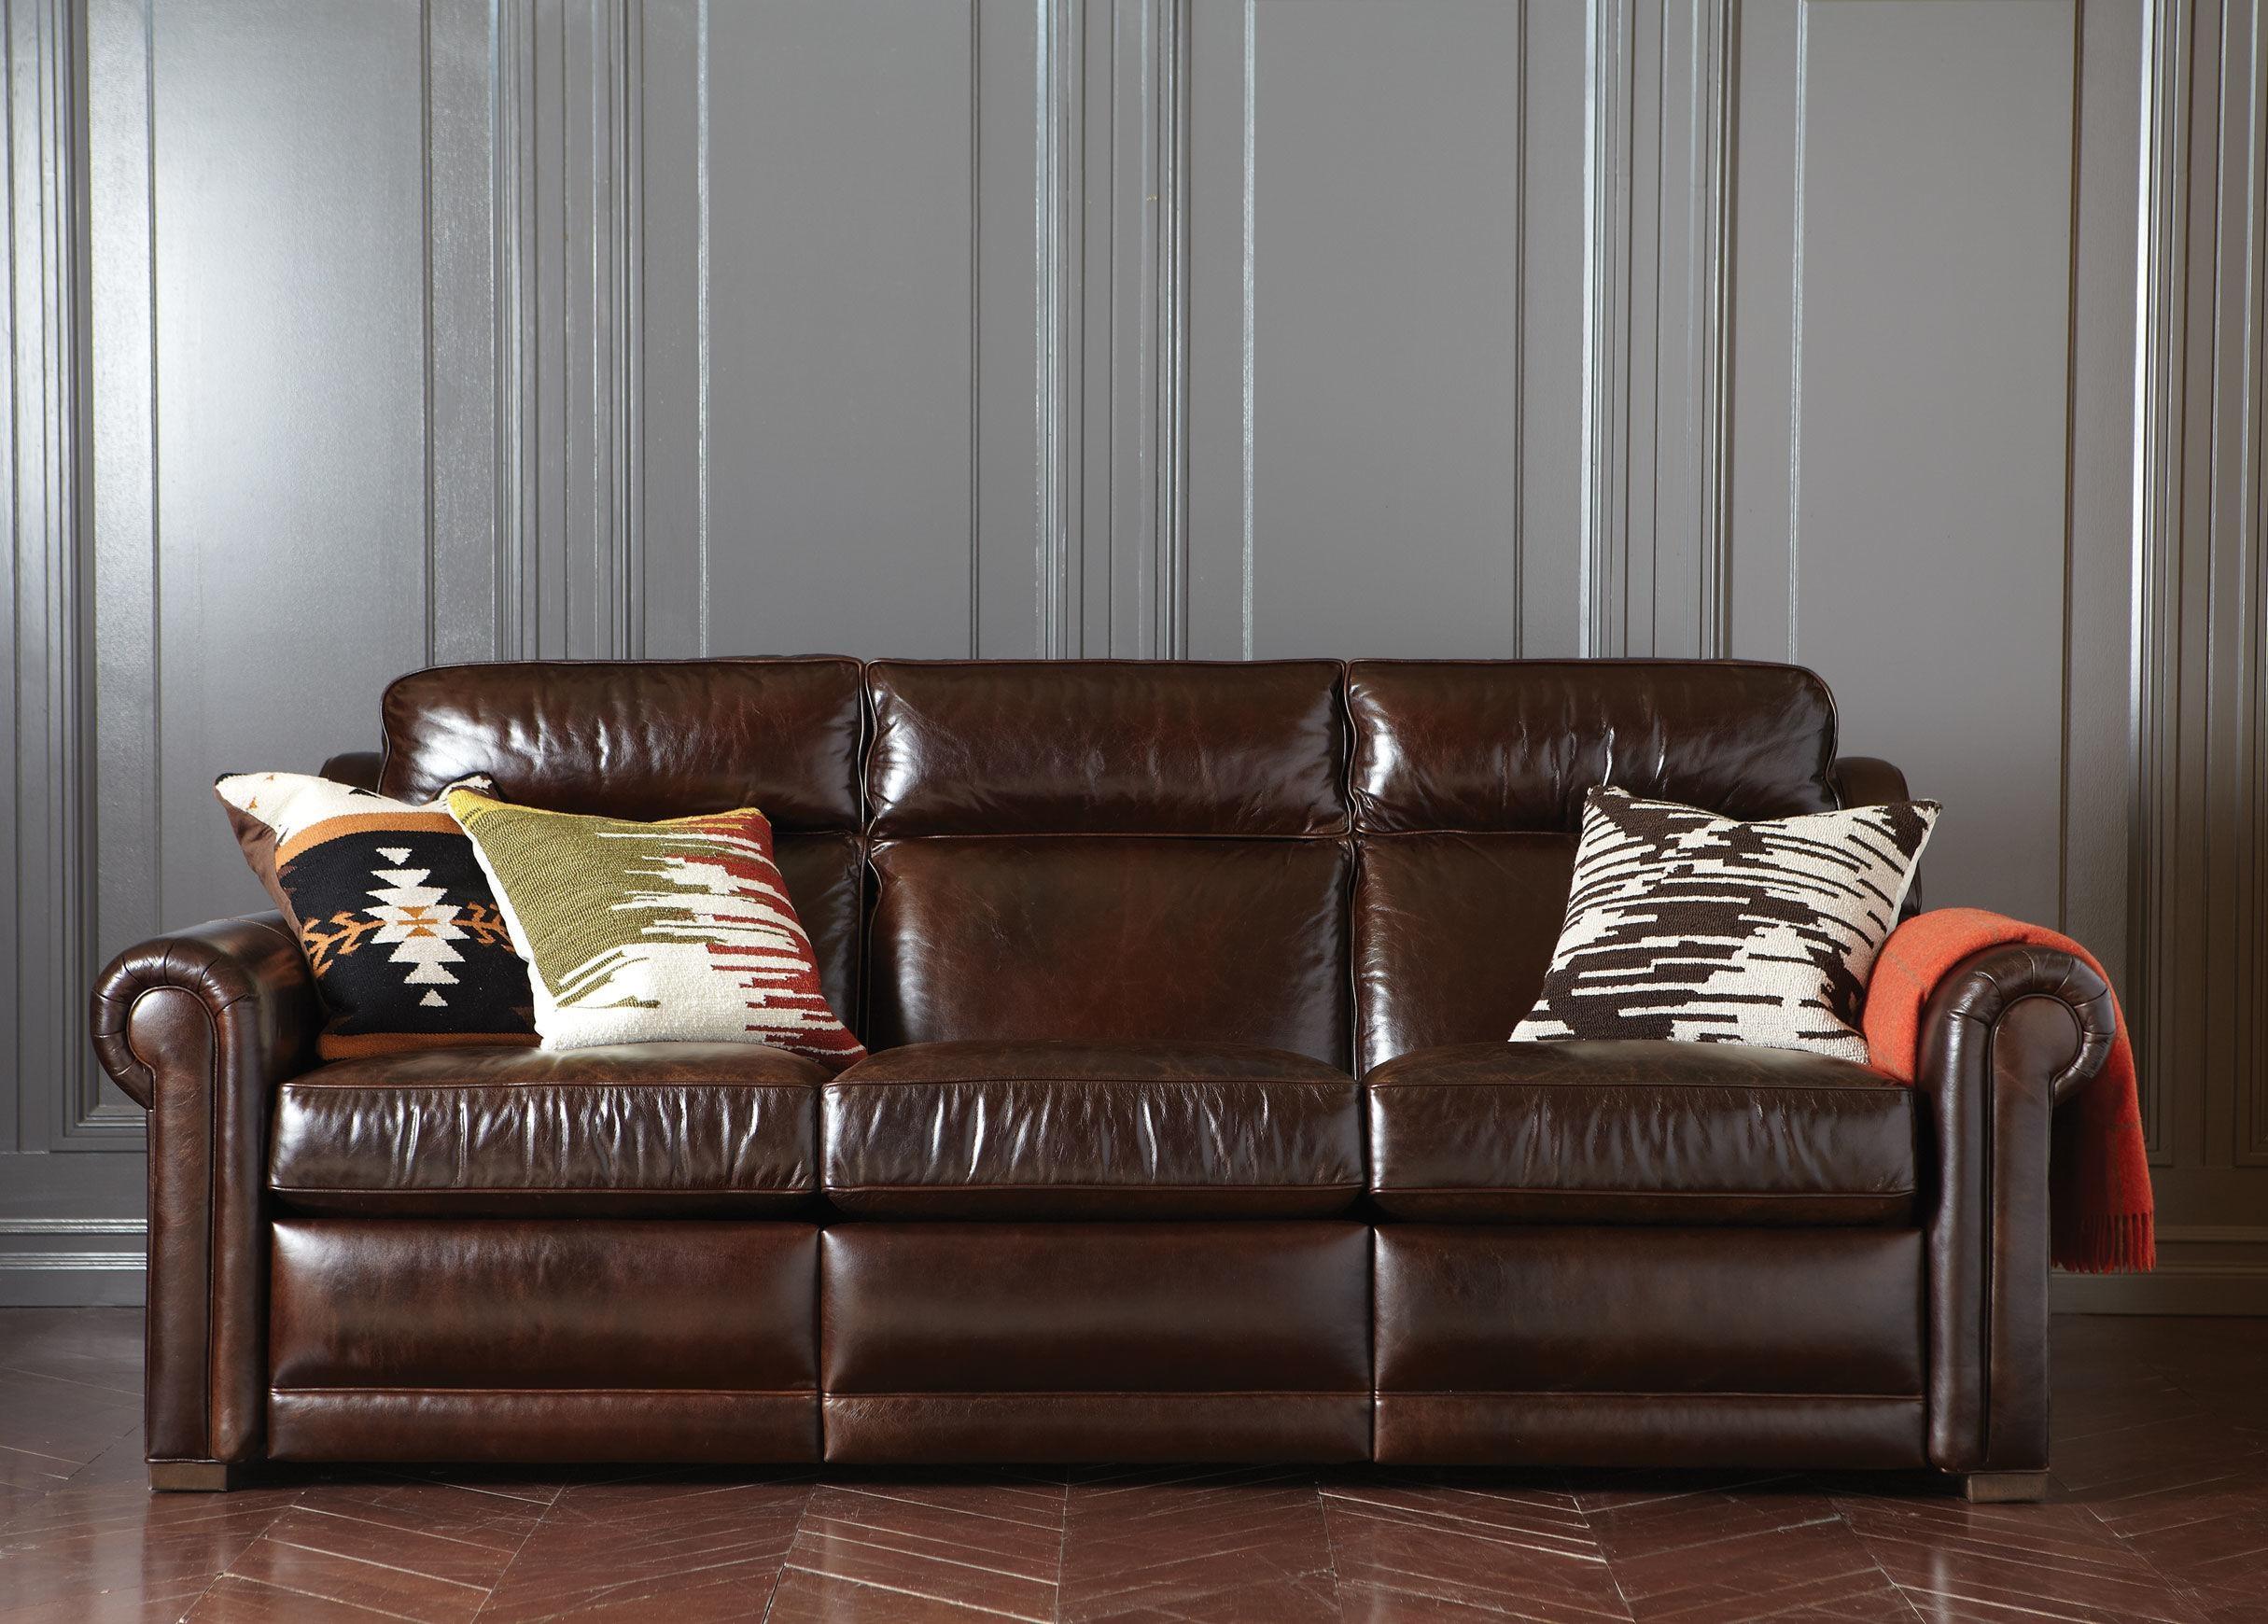 chadwick sofa ethan allen reviews armless sectional 20 top sofas ideas